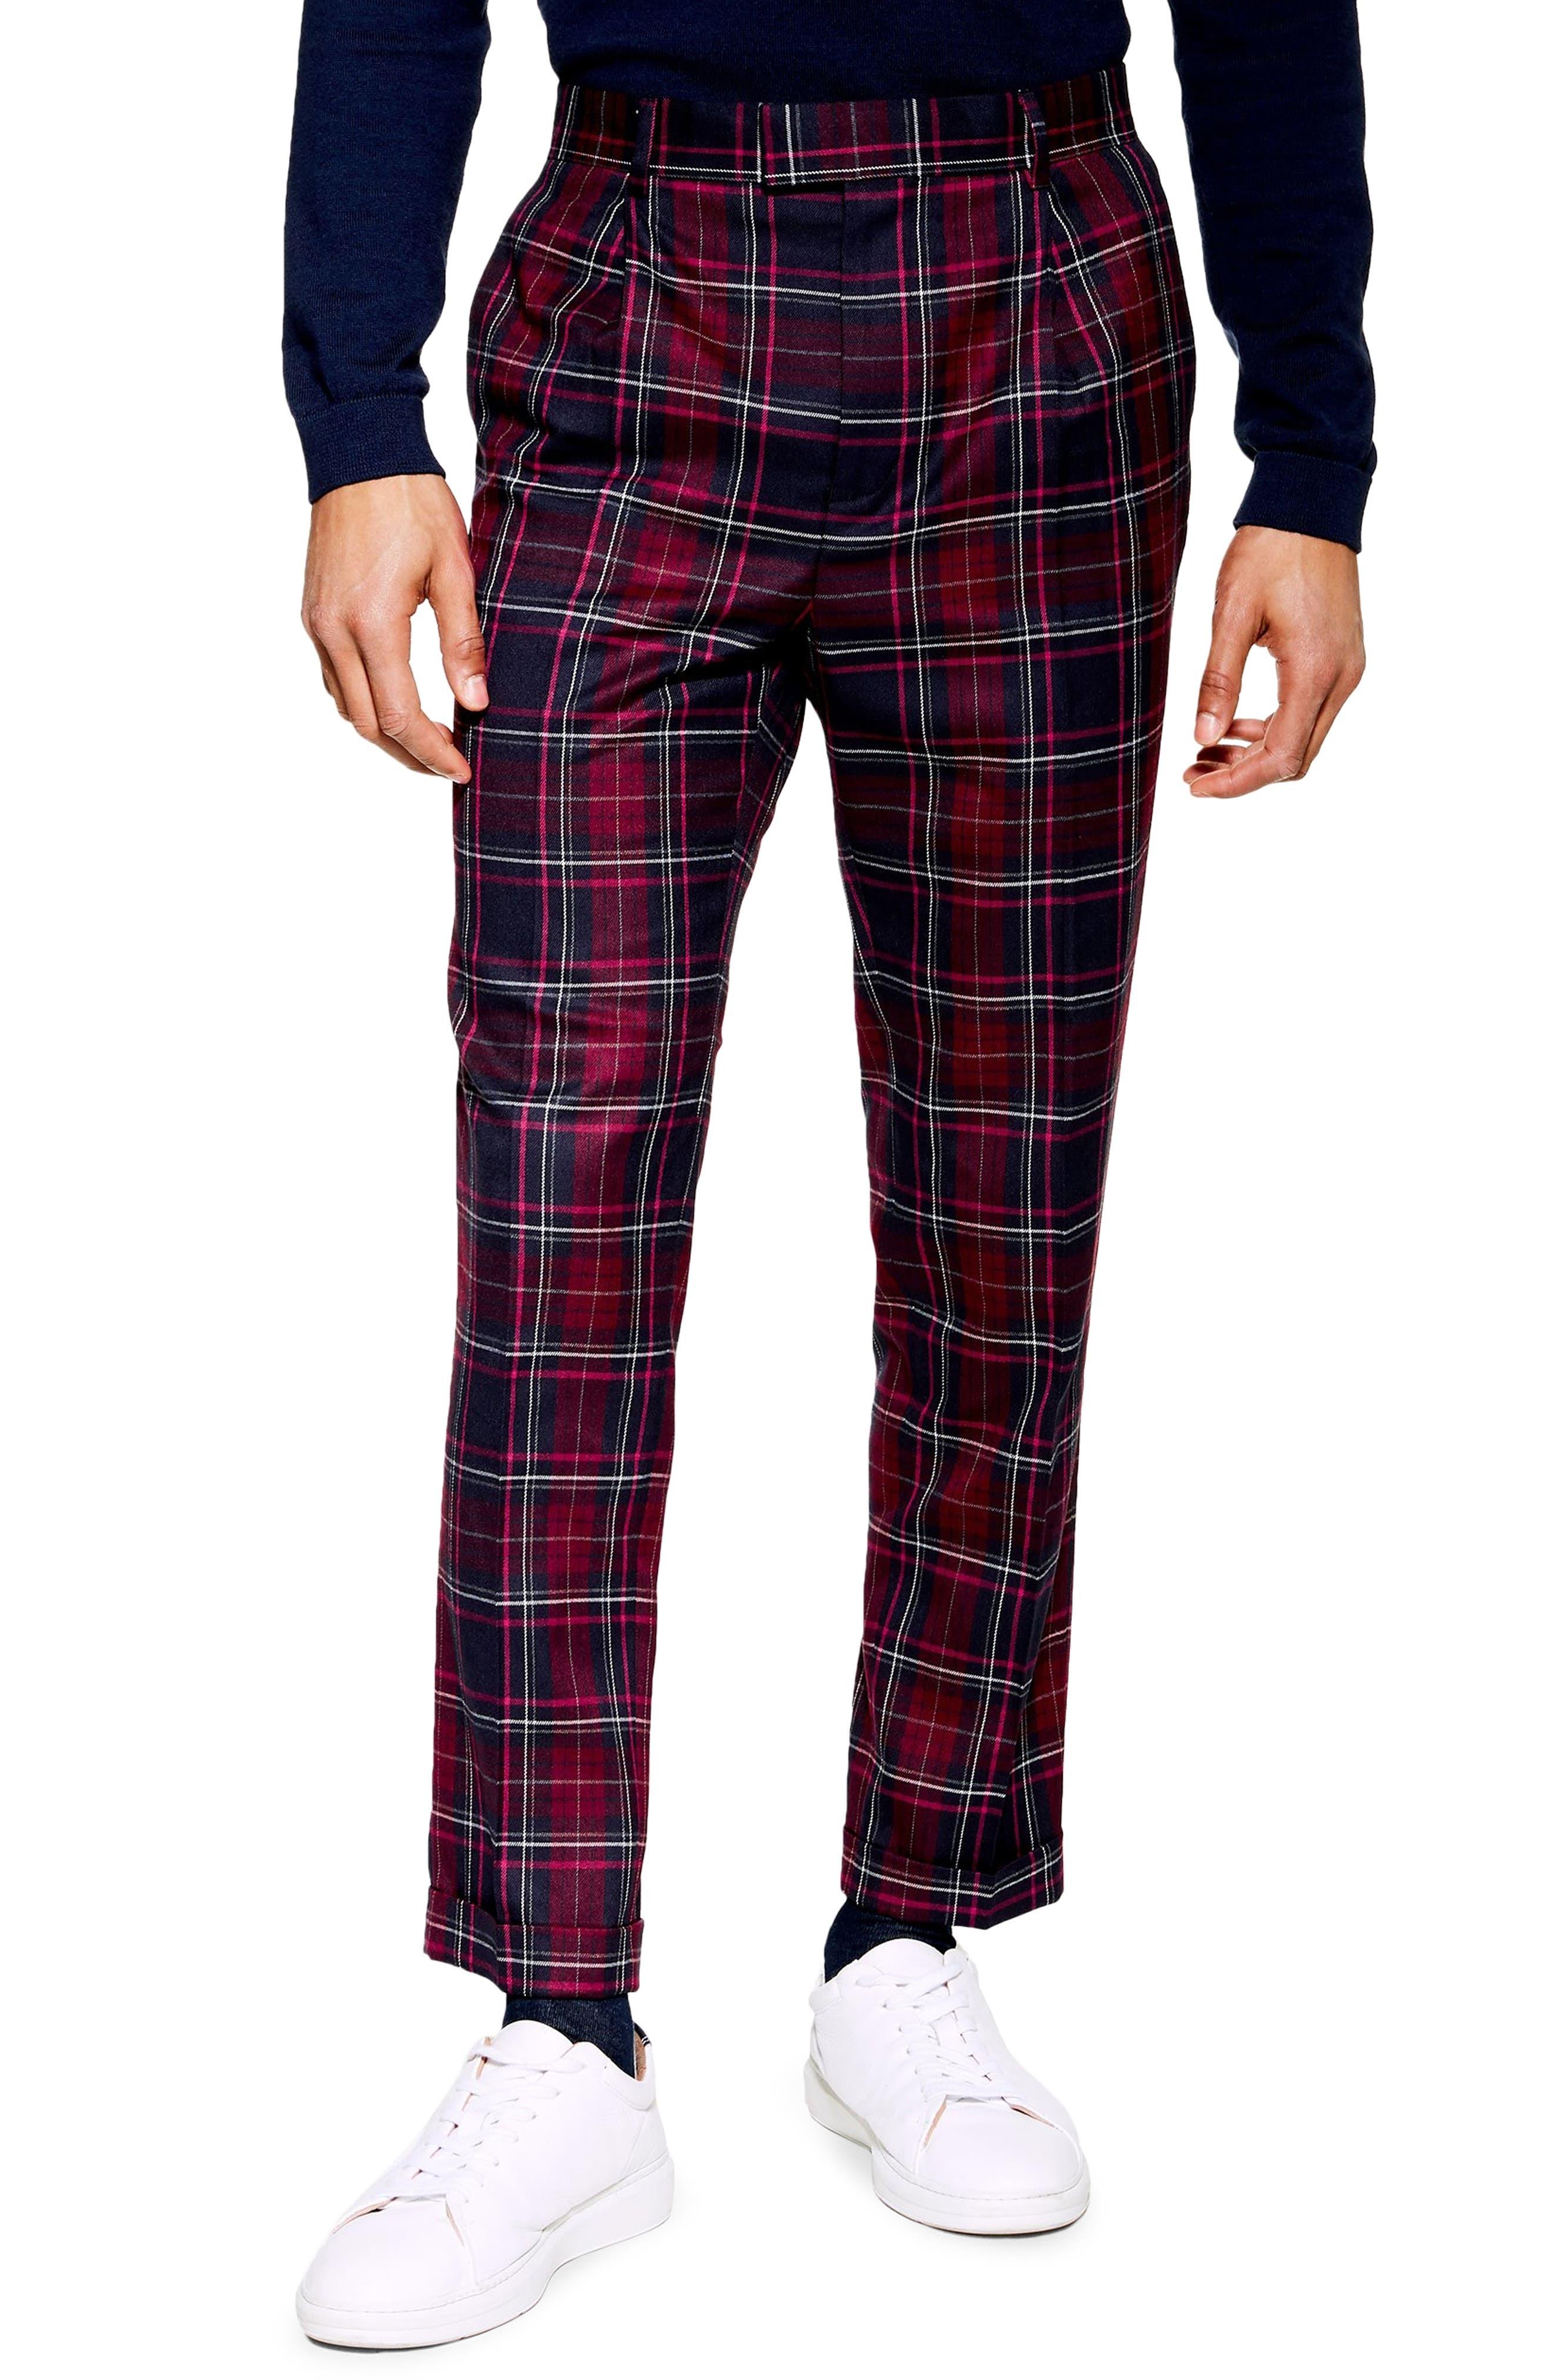 TOPMAN, Skinny Fit Check Trousers, Main thumbnail 1, color, BURGUNDY MULTI